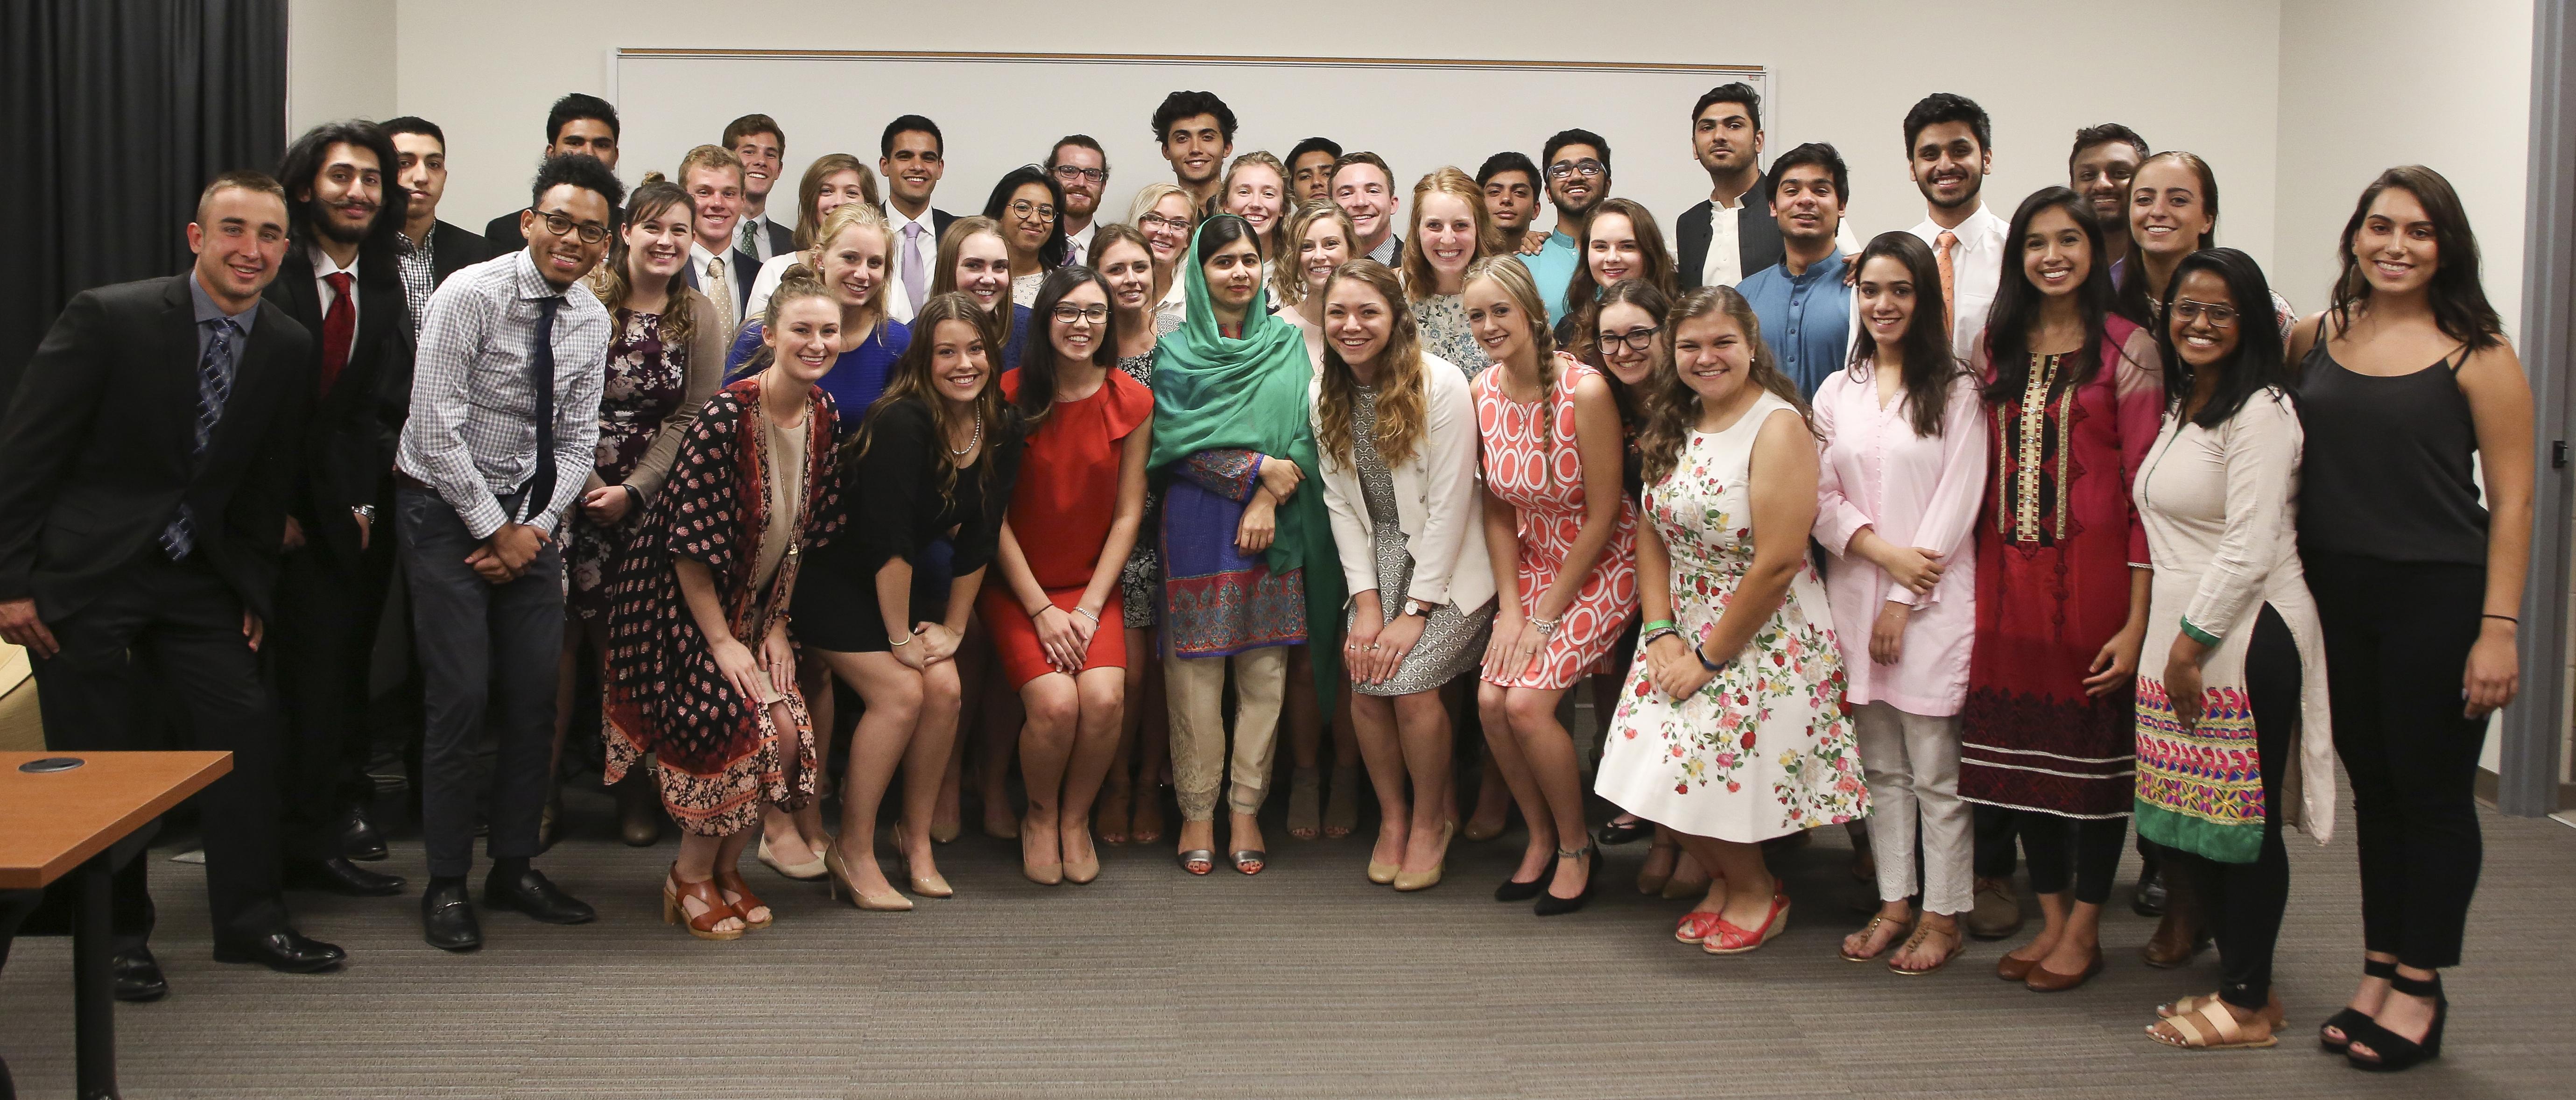 Malala Yousafzai with DePauw students; Sept. 4, 2017